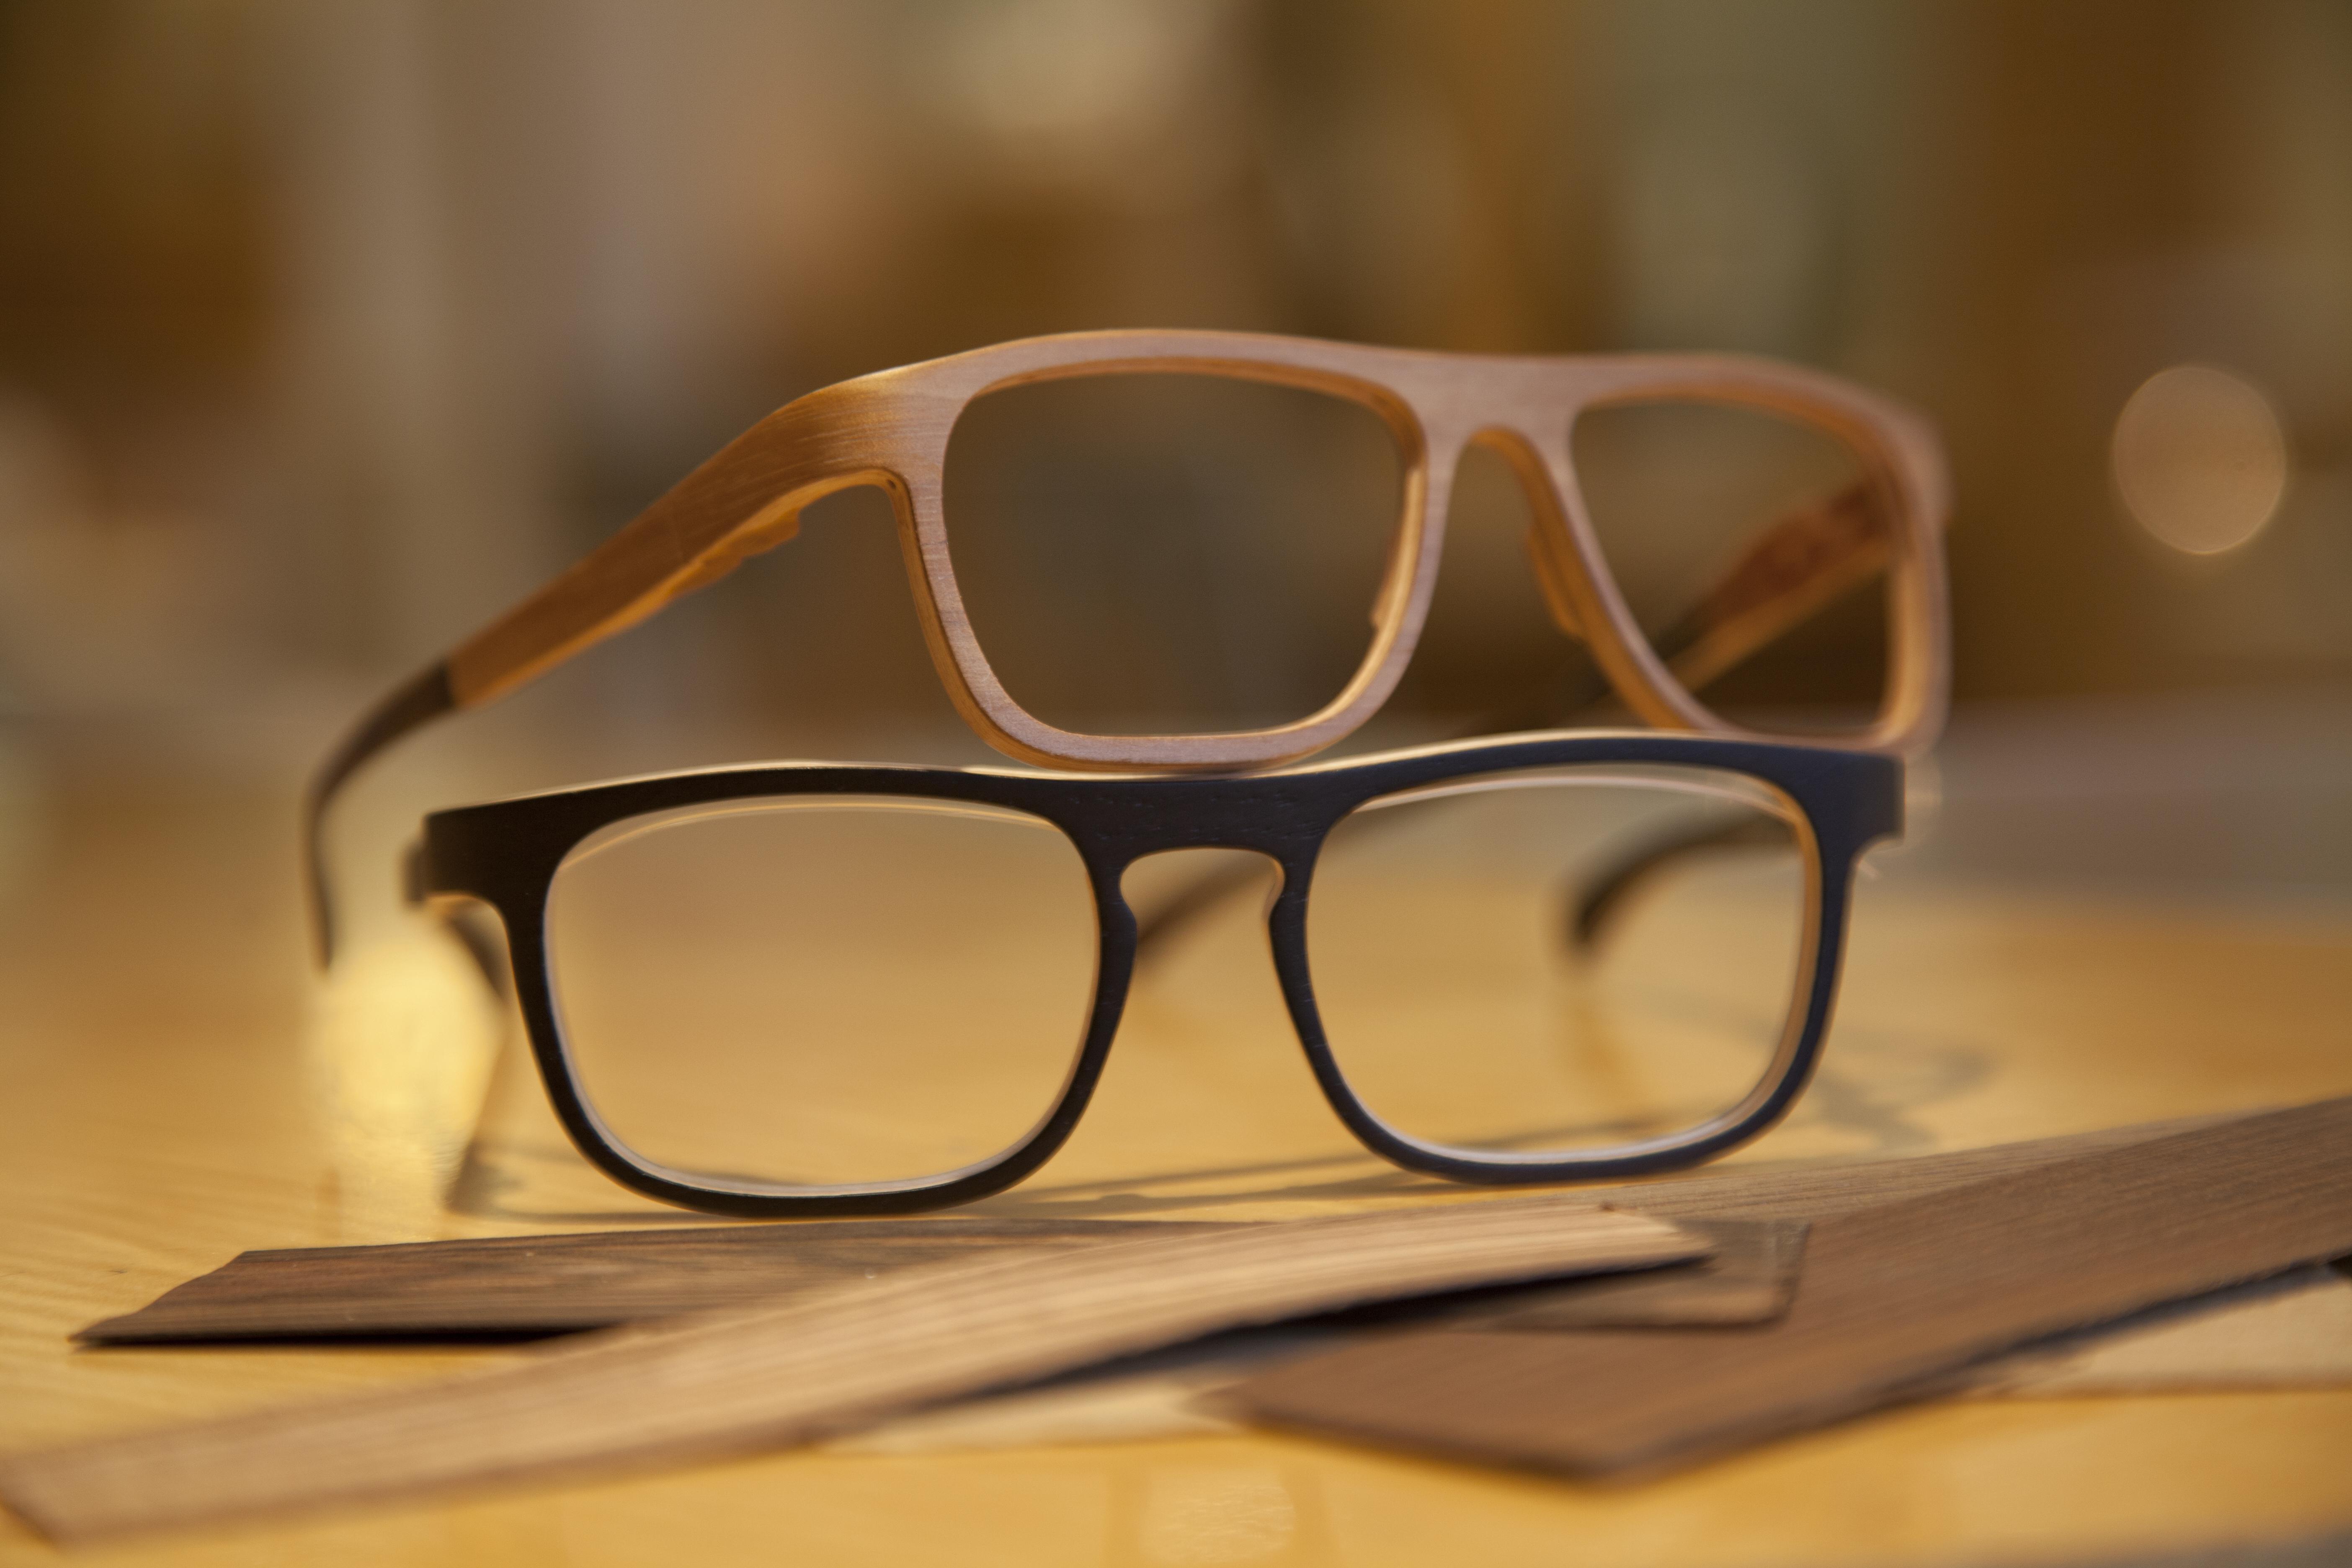 Rolf Spectacles | Brillenmarken | Optik | Lauscher Optik-Uhren ...